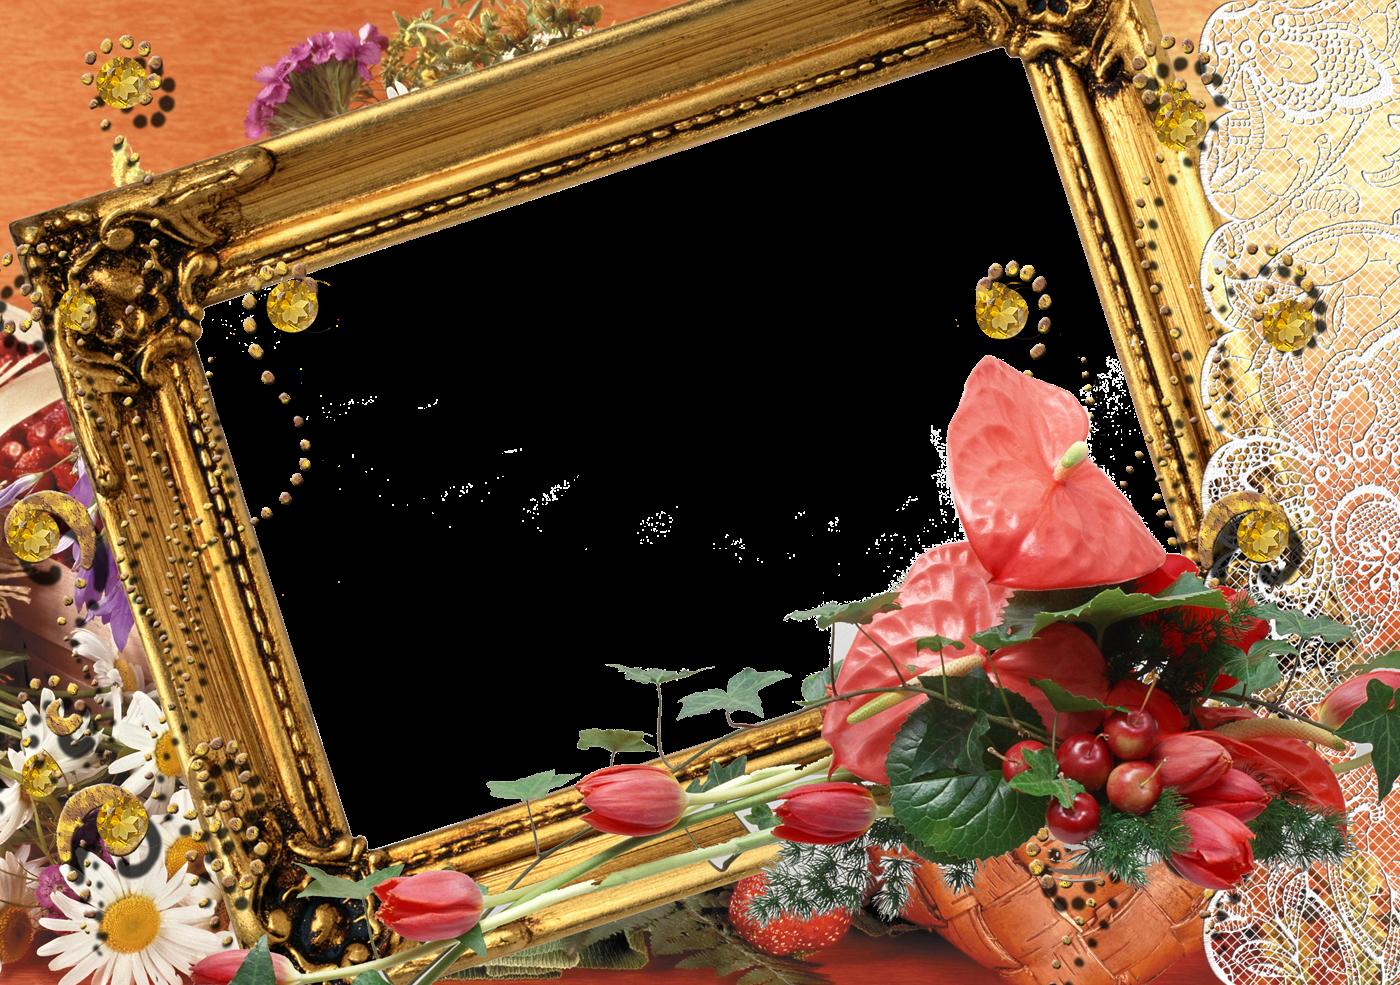 http://3.bp.blogspot.com/-MBG8PW8xmxM/UA_NbiolD5I/AAAAAAAAKKM/8z1V4zNyK_Q/s1600/Love-Photo-Frames+Beautiful+MarriageFrames+karishma+++album+++frames++photos+++background+++new+marriage+frames+karishma+frames+-+background+-album+-+sekar+-+photo+shop+-+marriage+album+frames+-+family+ba+%2813%29.png